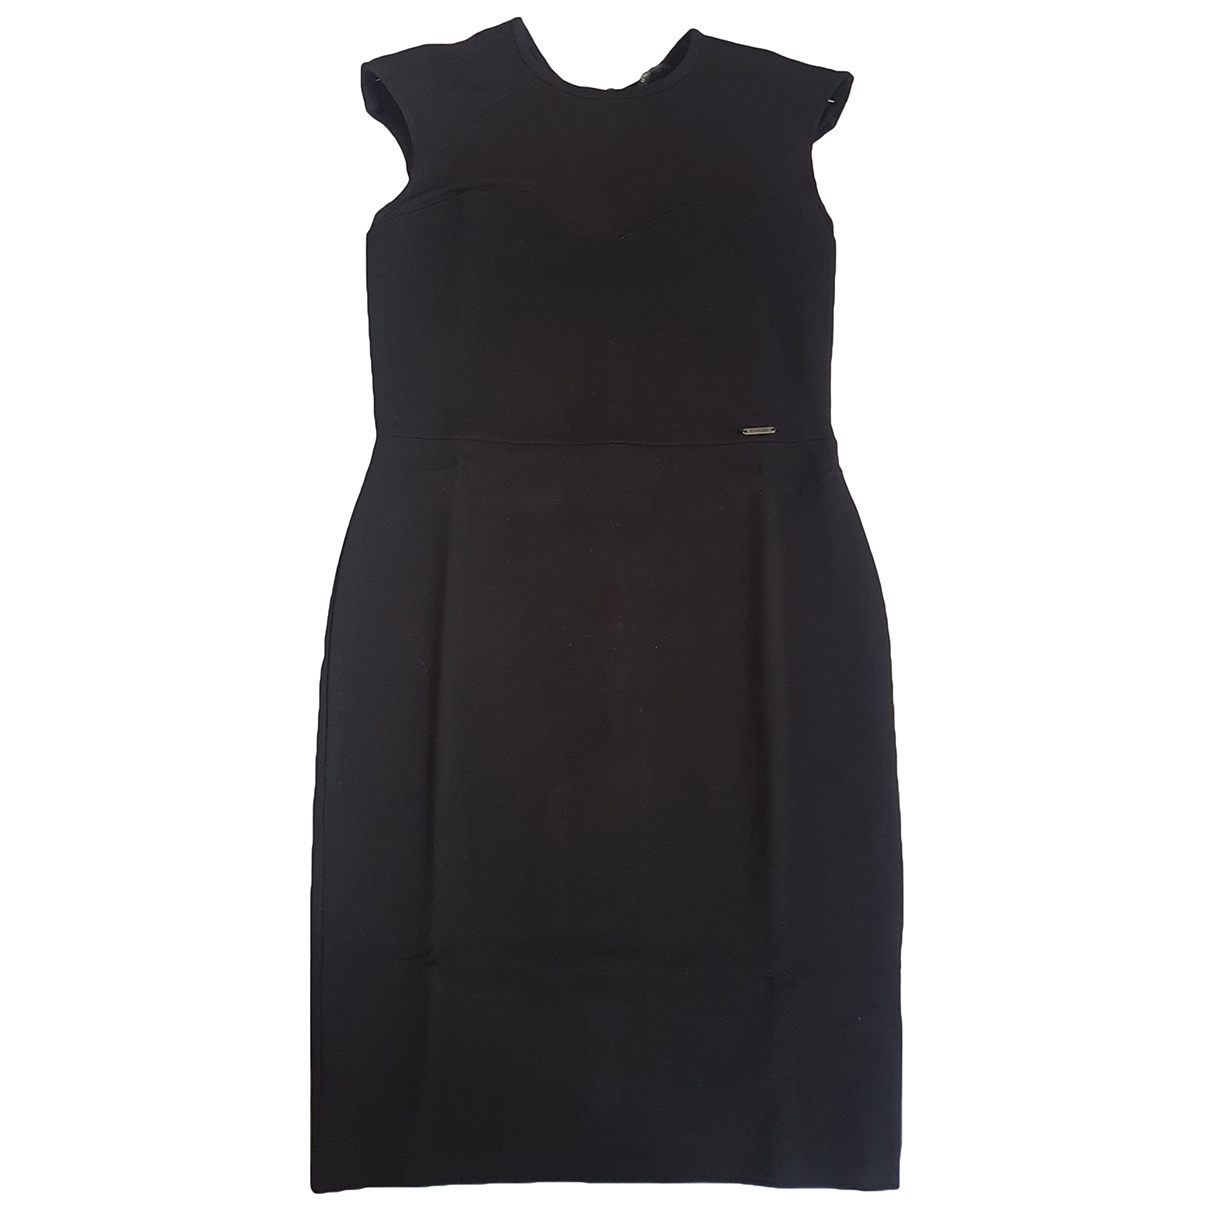 Guess \N Black dress for Women M International